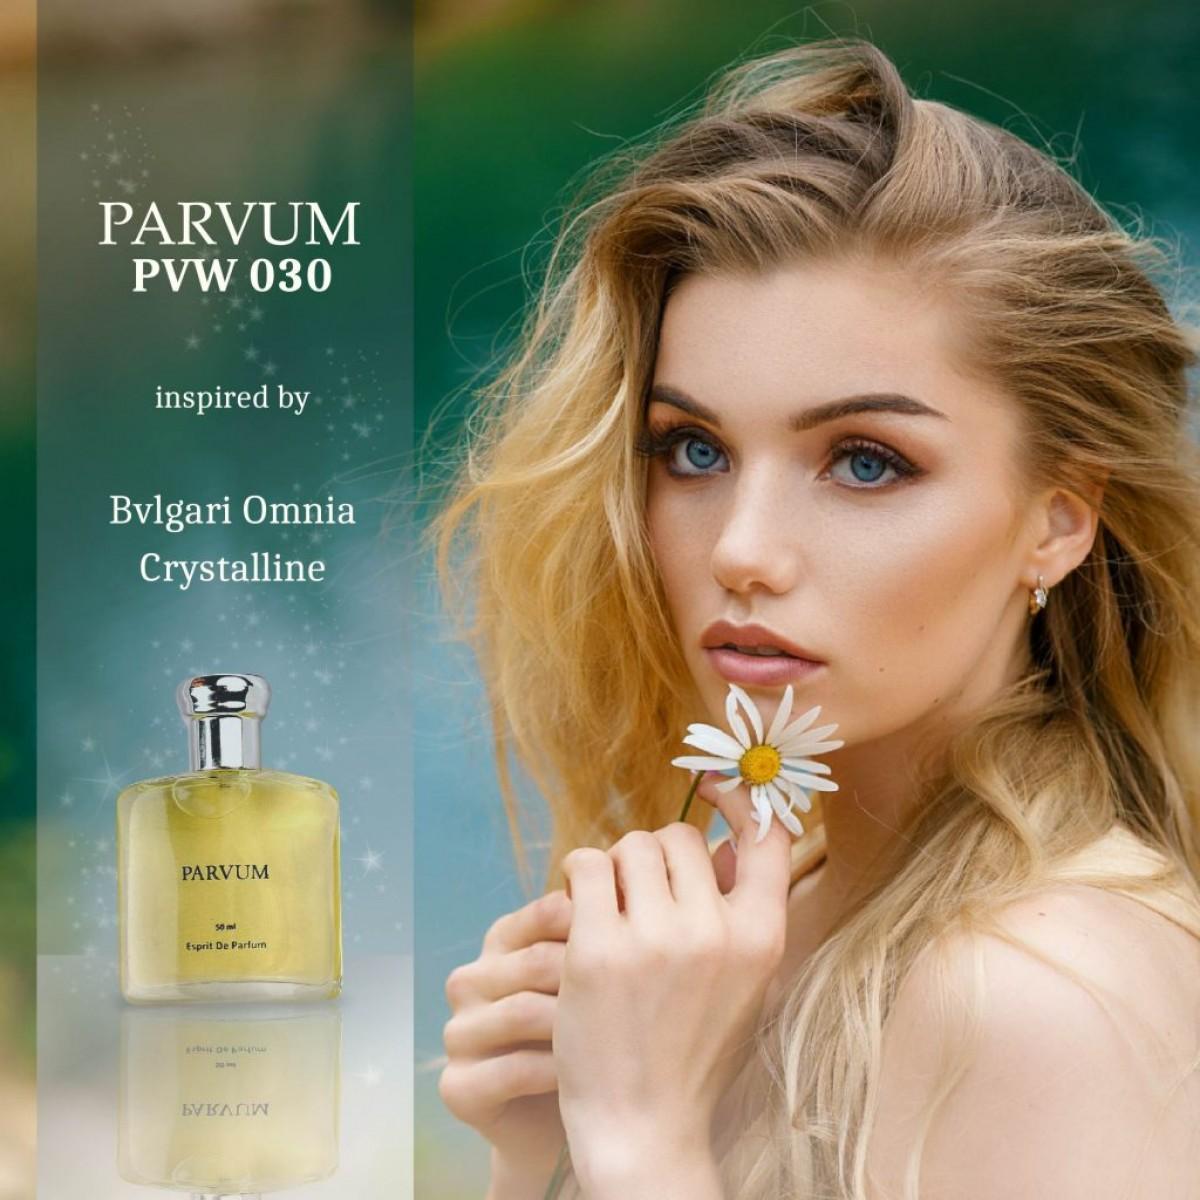 PARVUM Inspired By Bvlgari Omnia Crystalline - Hara & Co